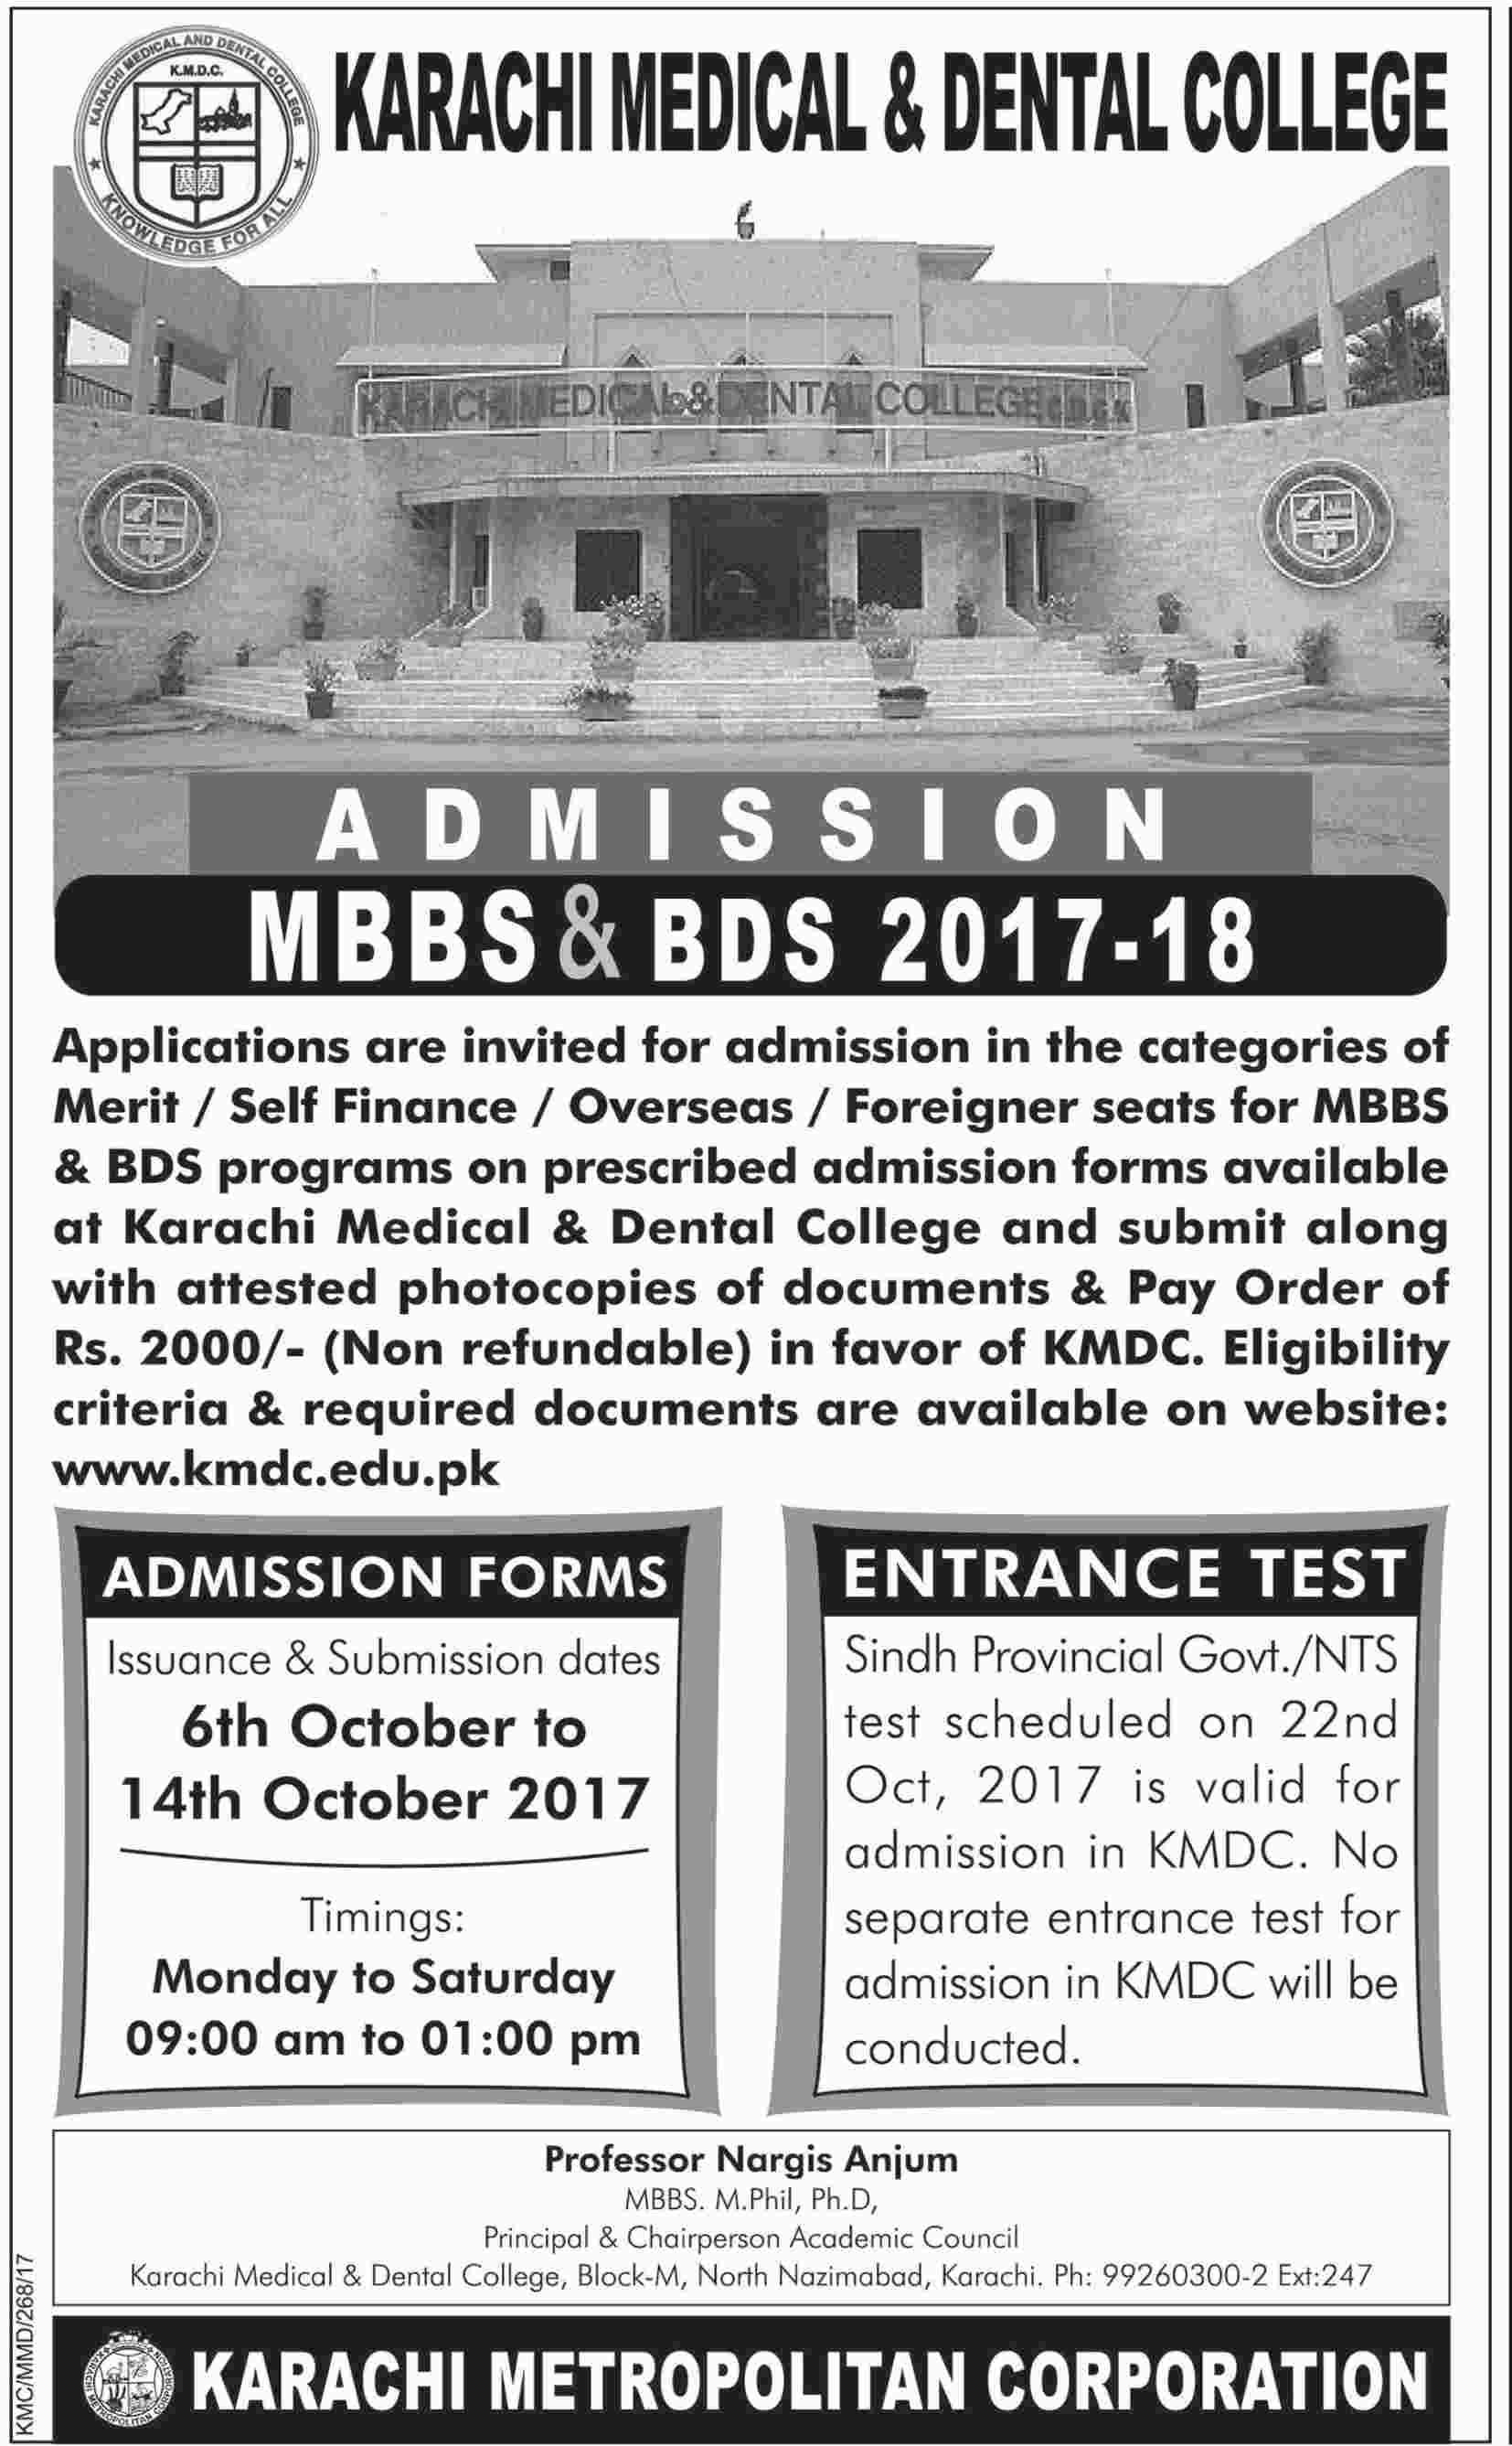 Karachi Medical And Dental College KMDC Entry Test Date 2017